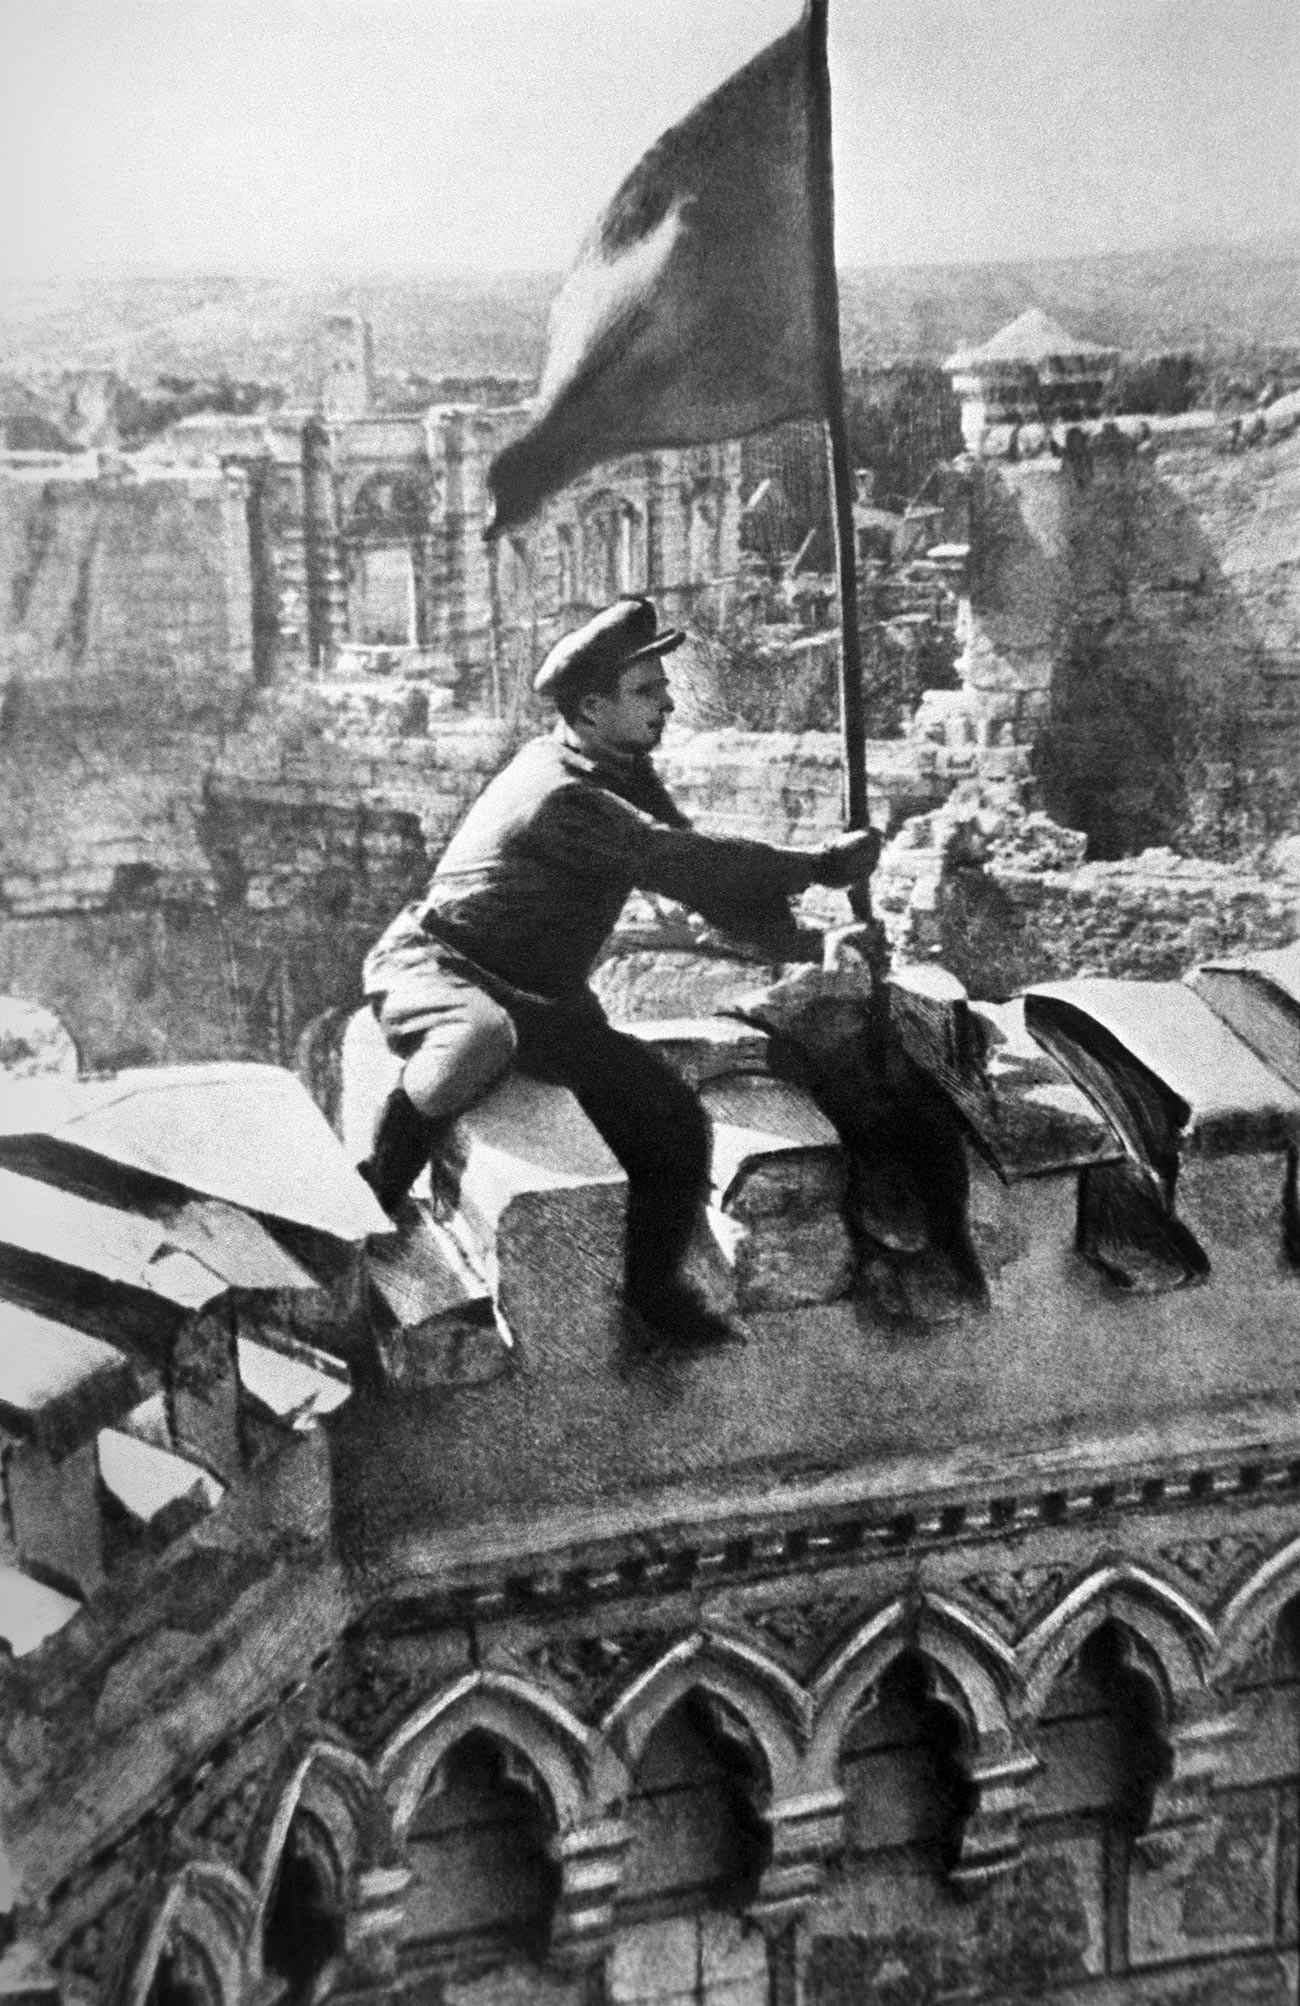 Levantando la bandera de la victoria sobre la Chisinau liberada, 1944.